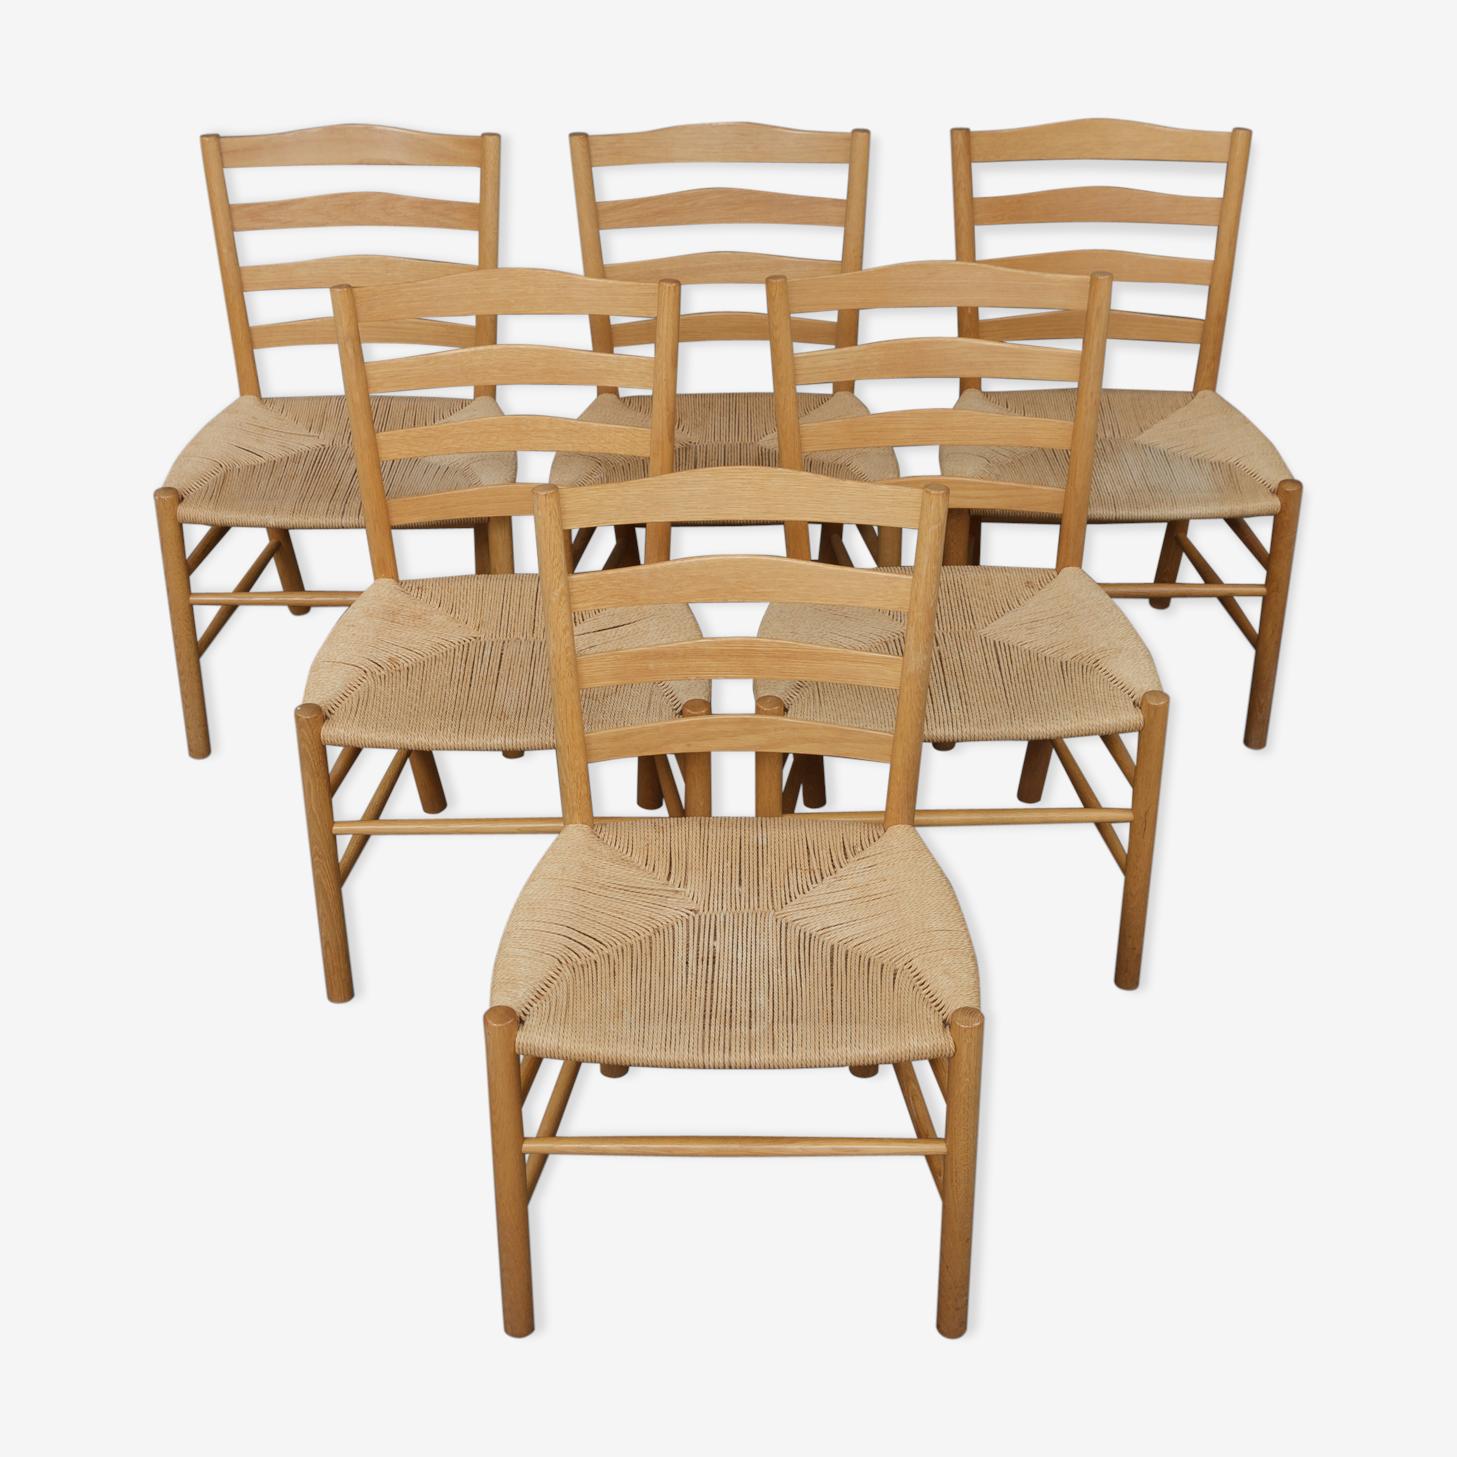 6 oak Church chairs by Kaare Klint 50s